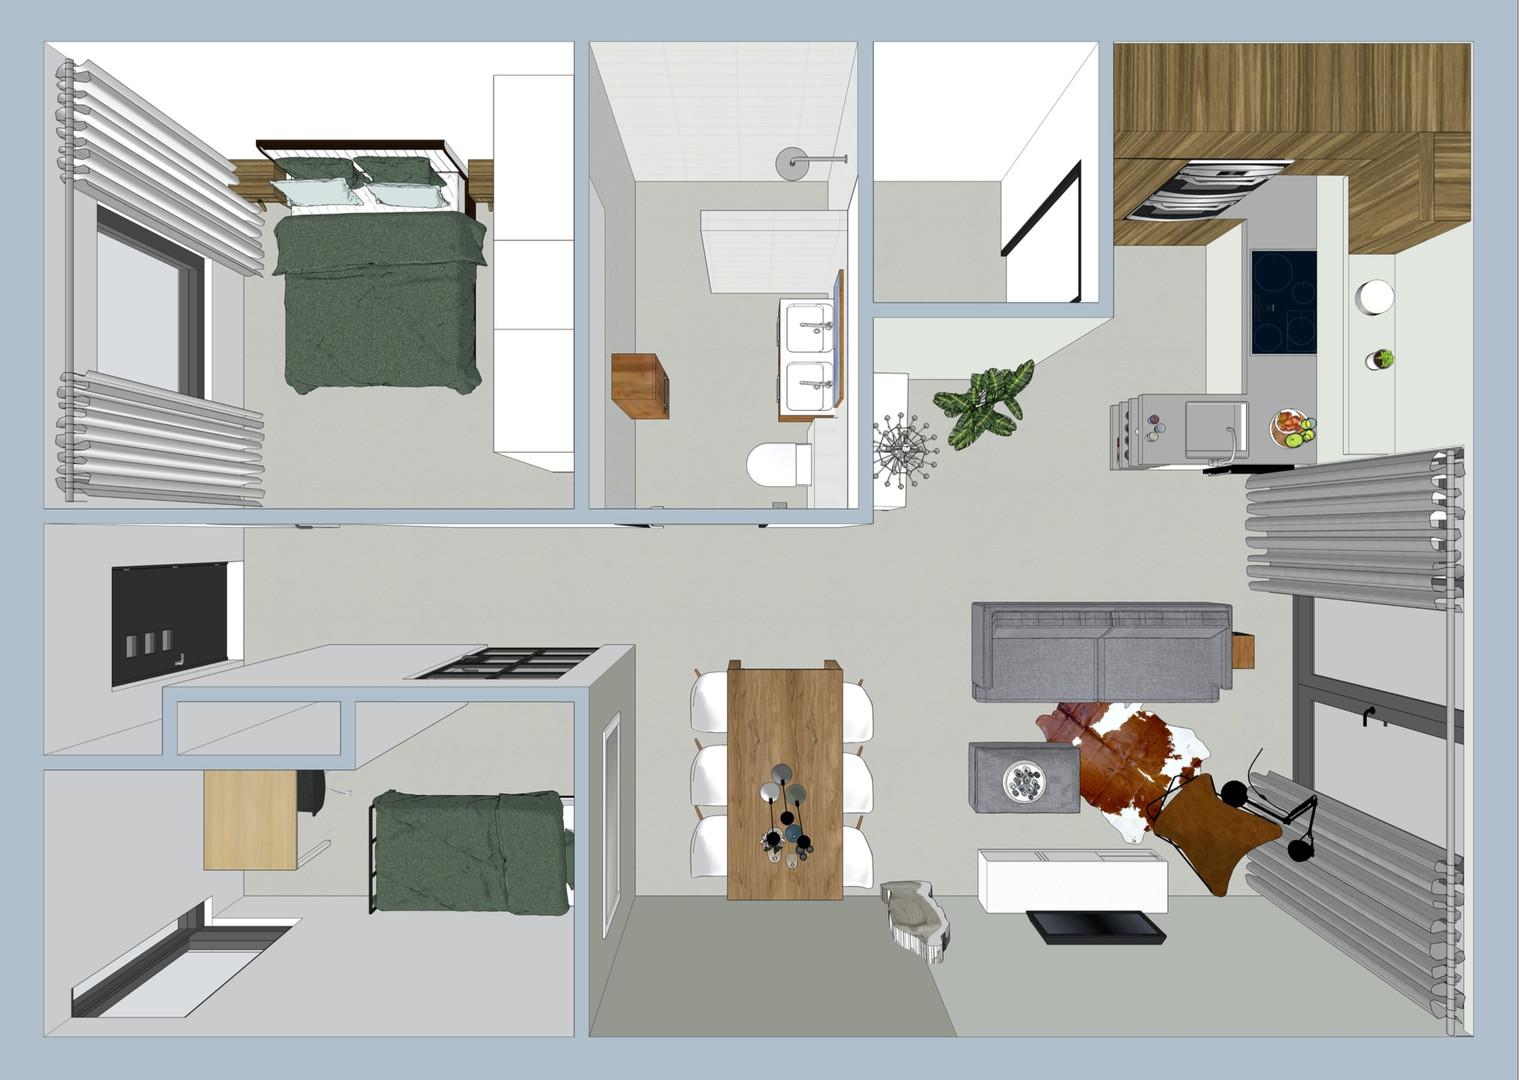 Plattegrond indeling woning